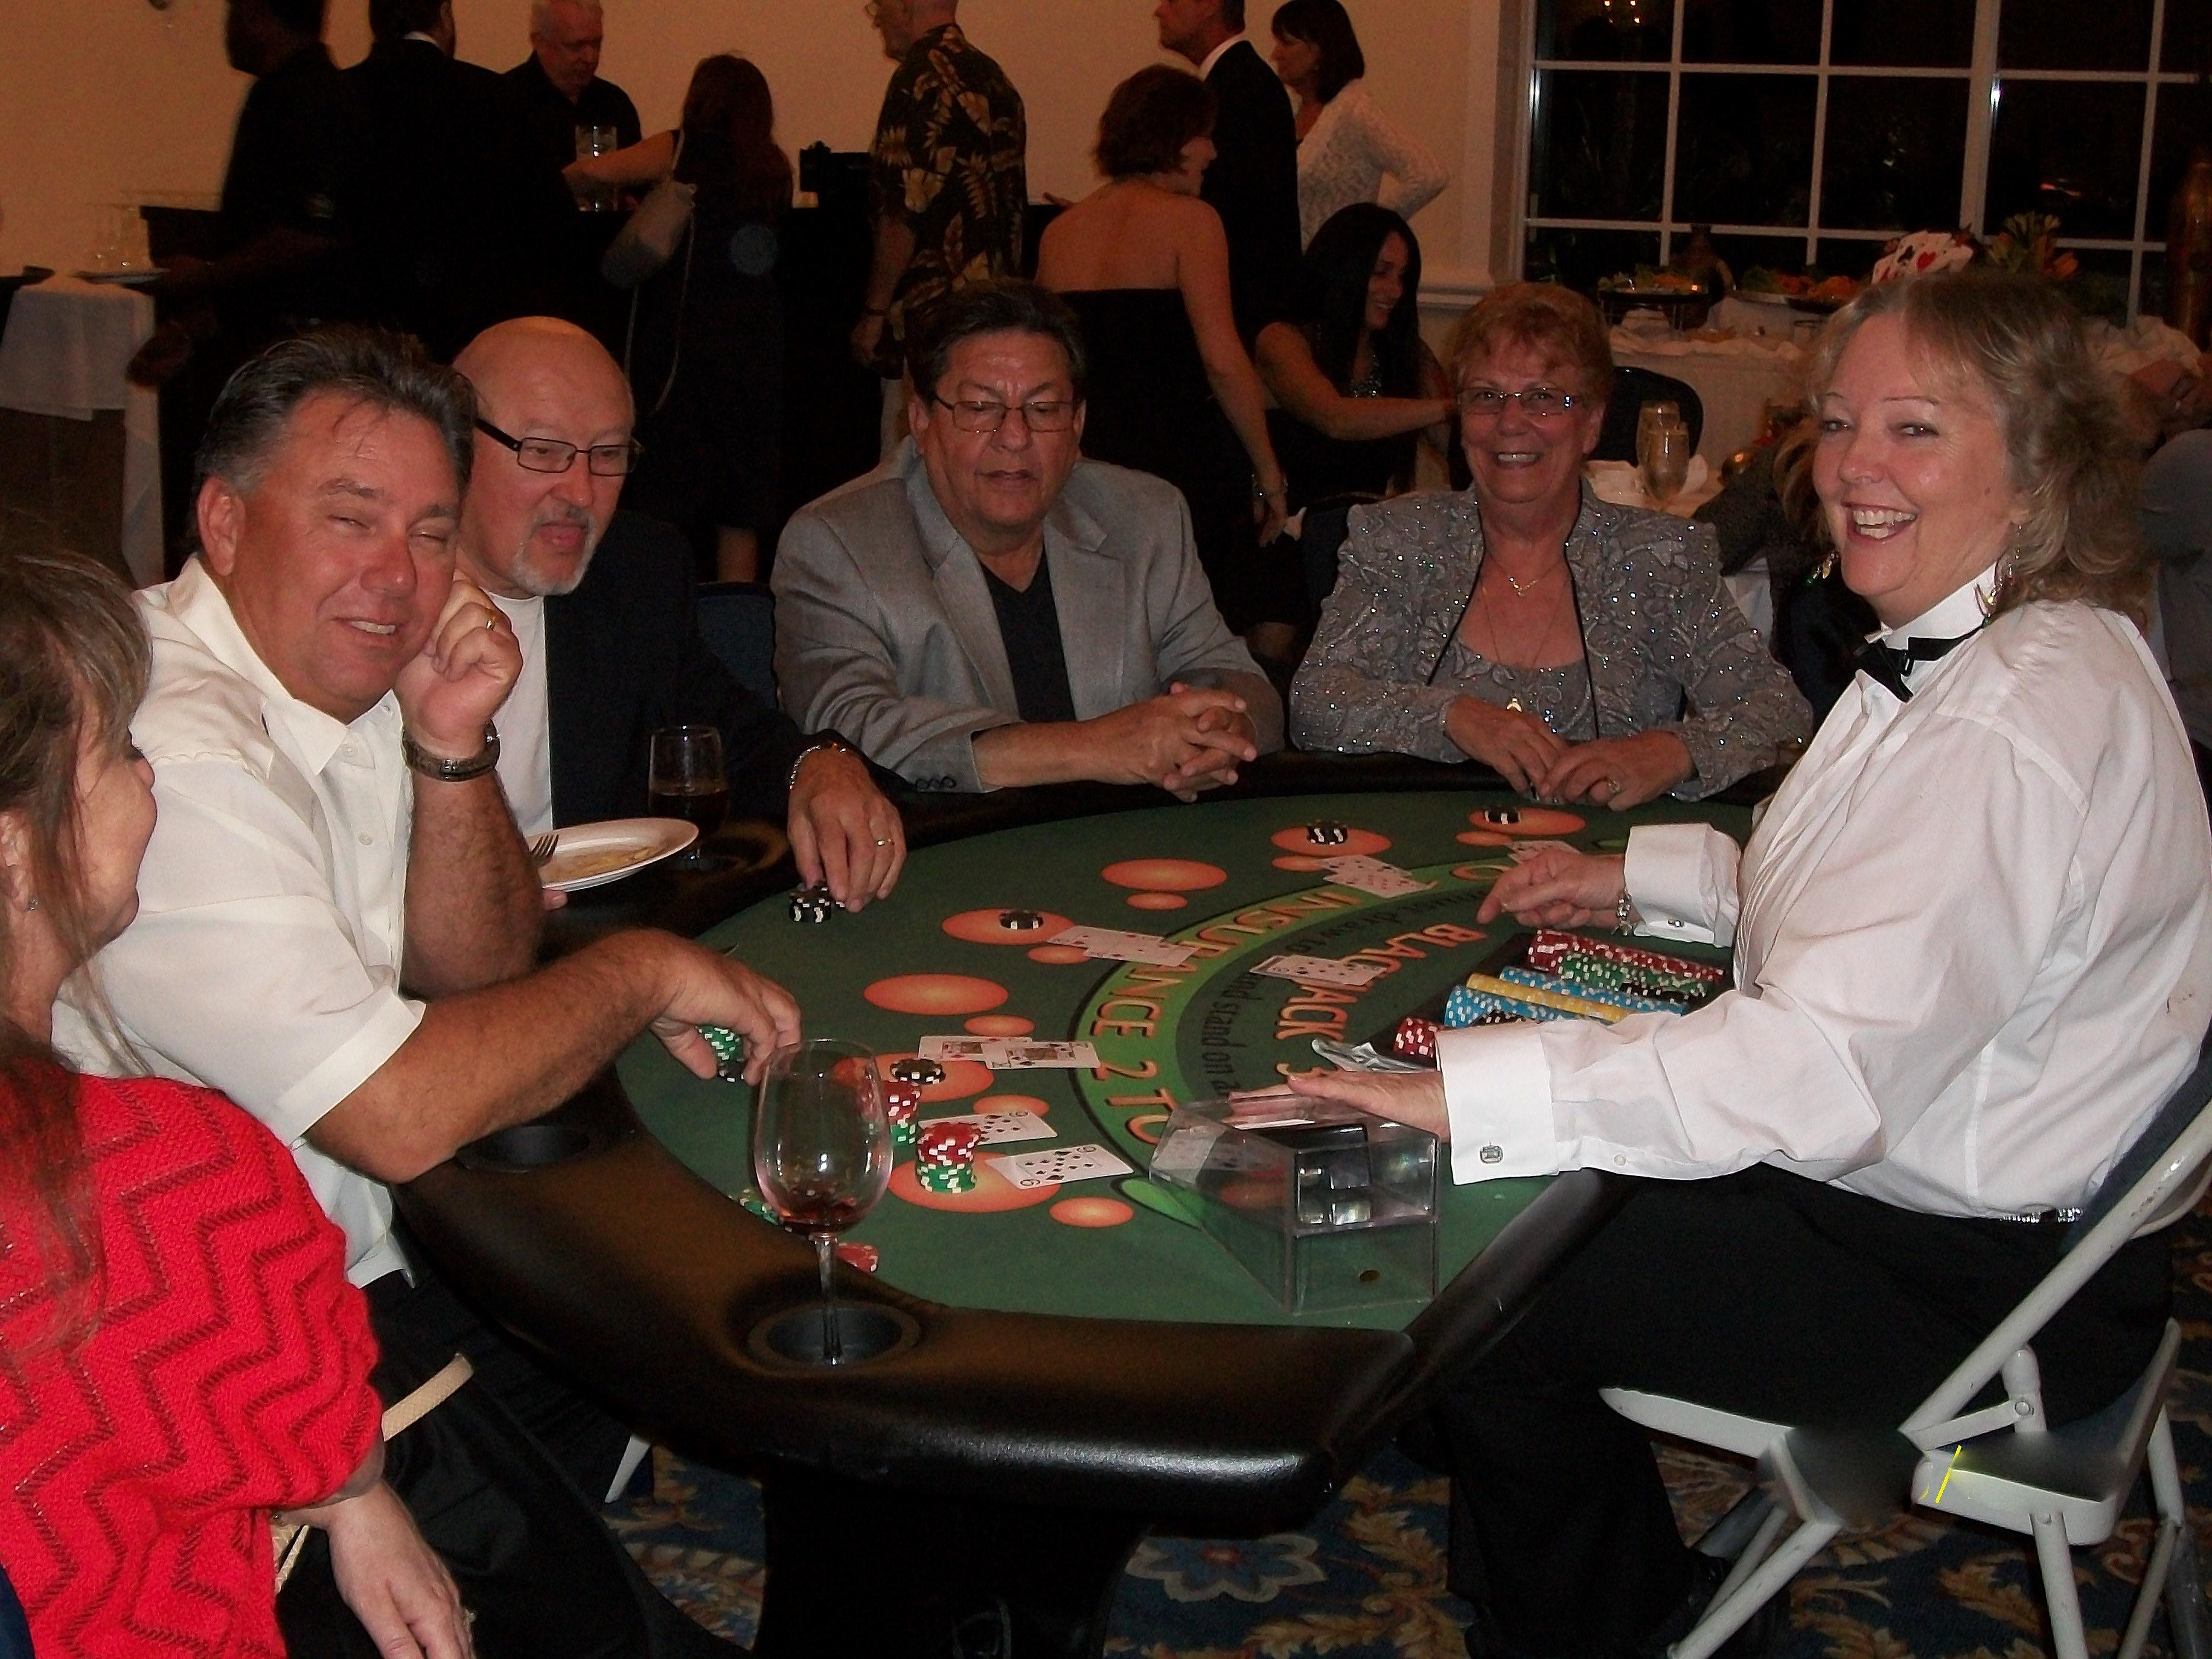 Palms casino corporate casino reel deal software